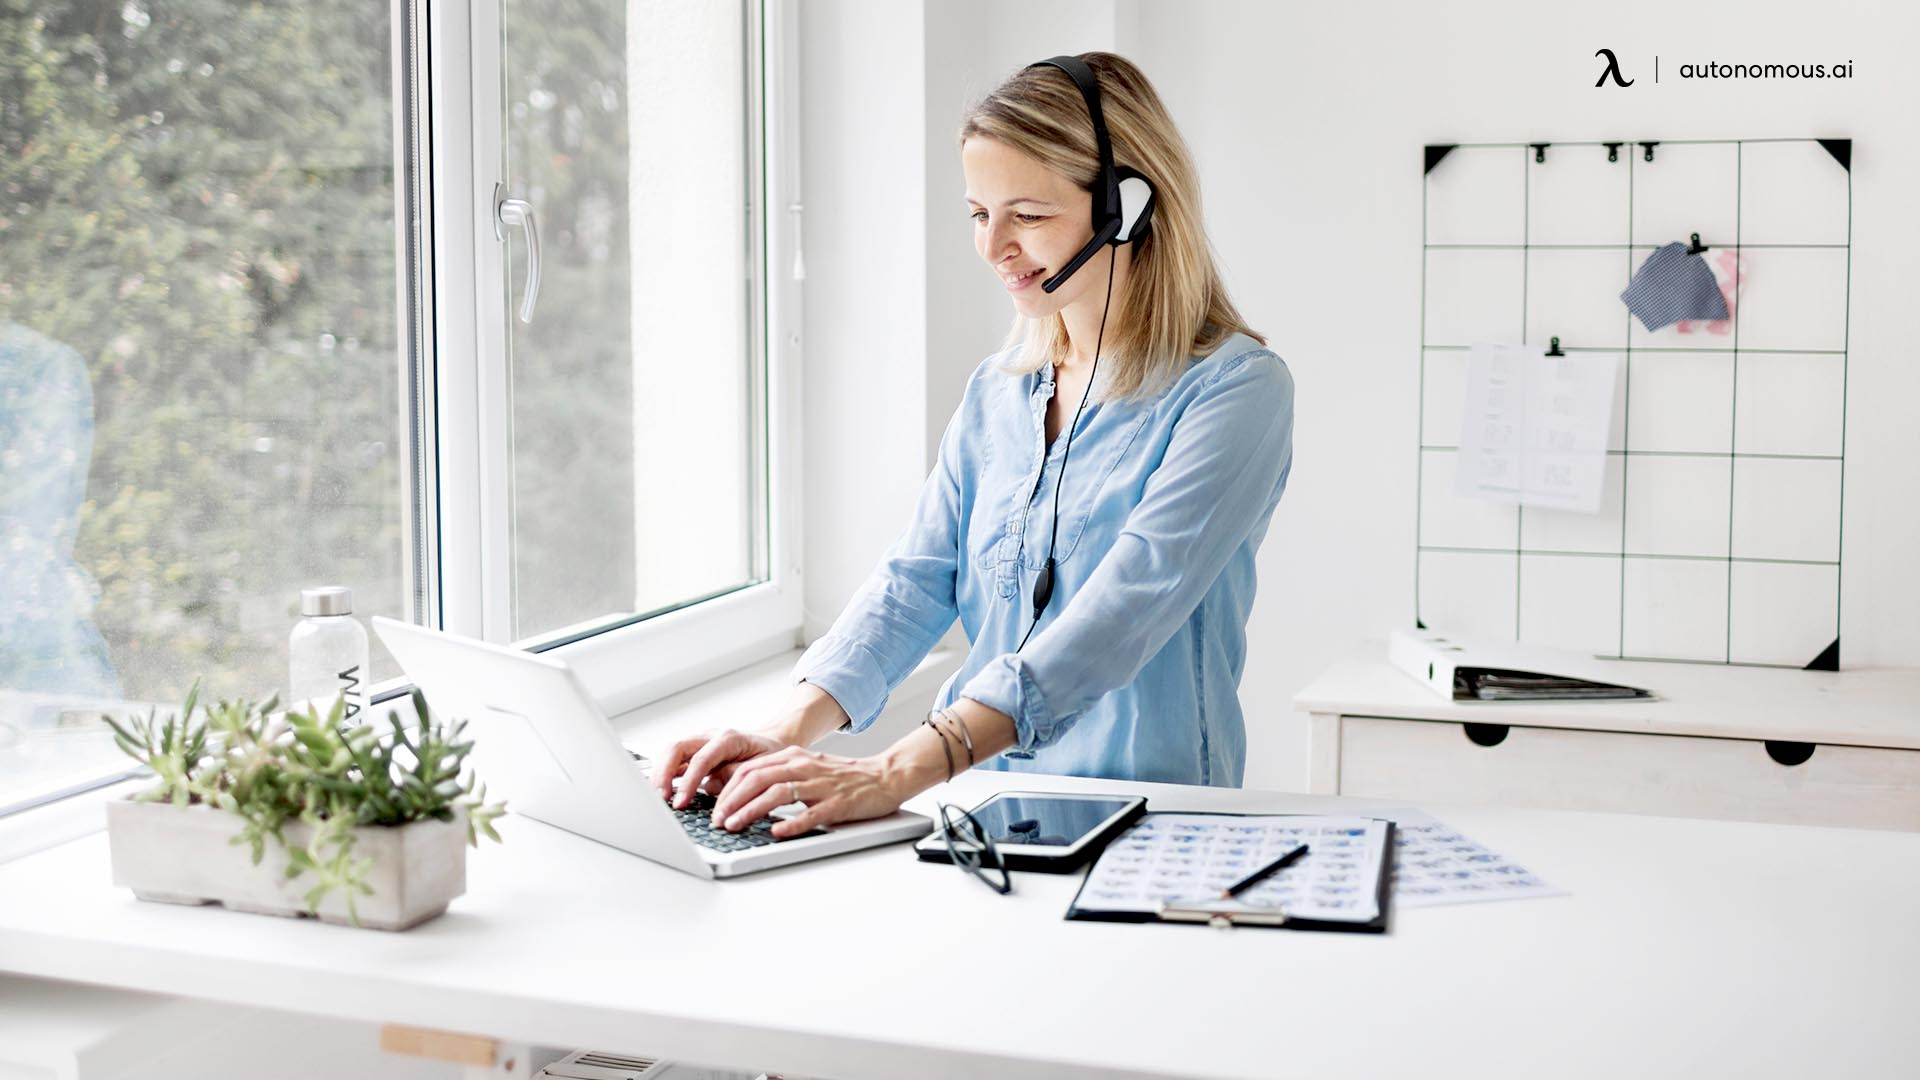 Types of Flexible Working Model